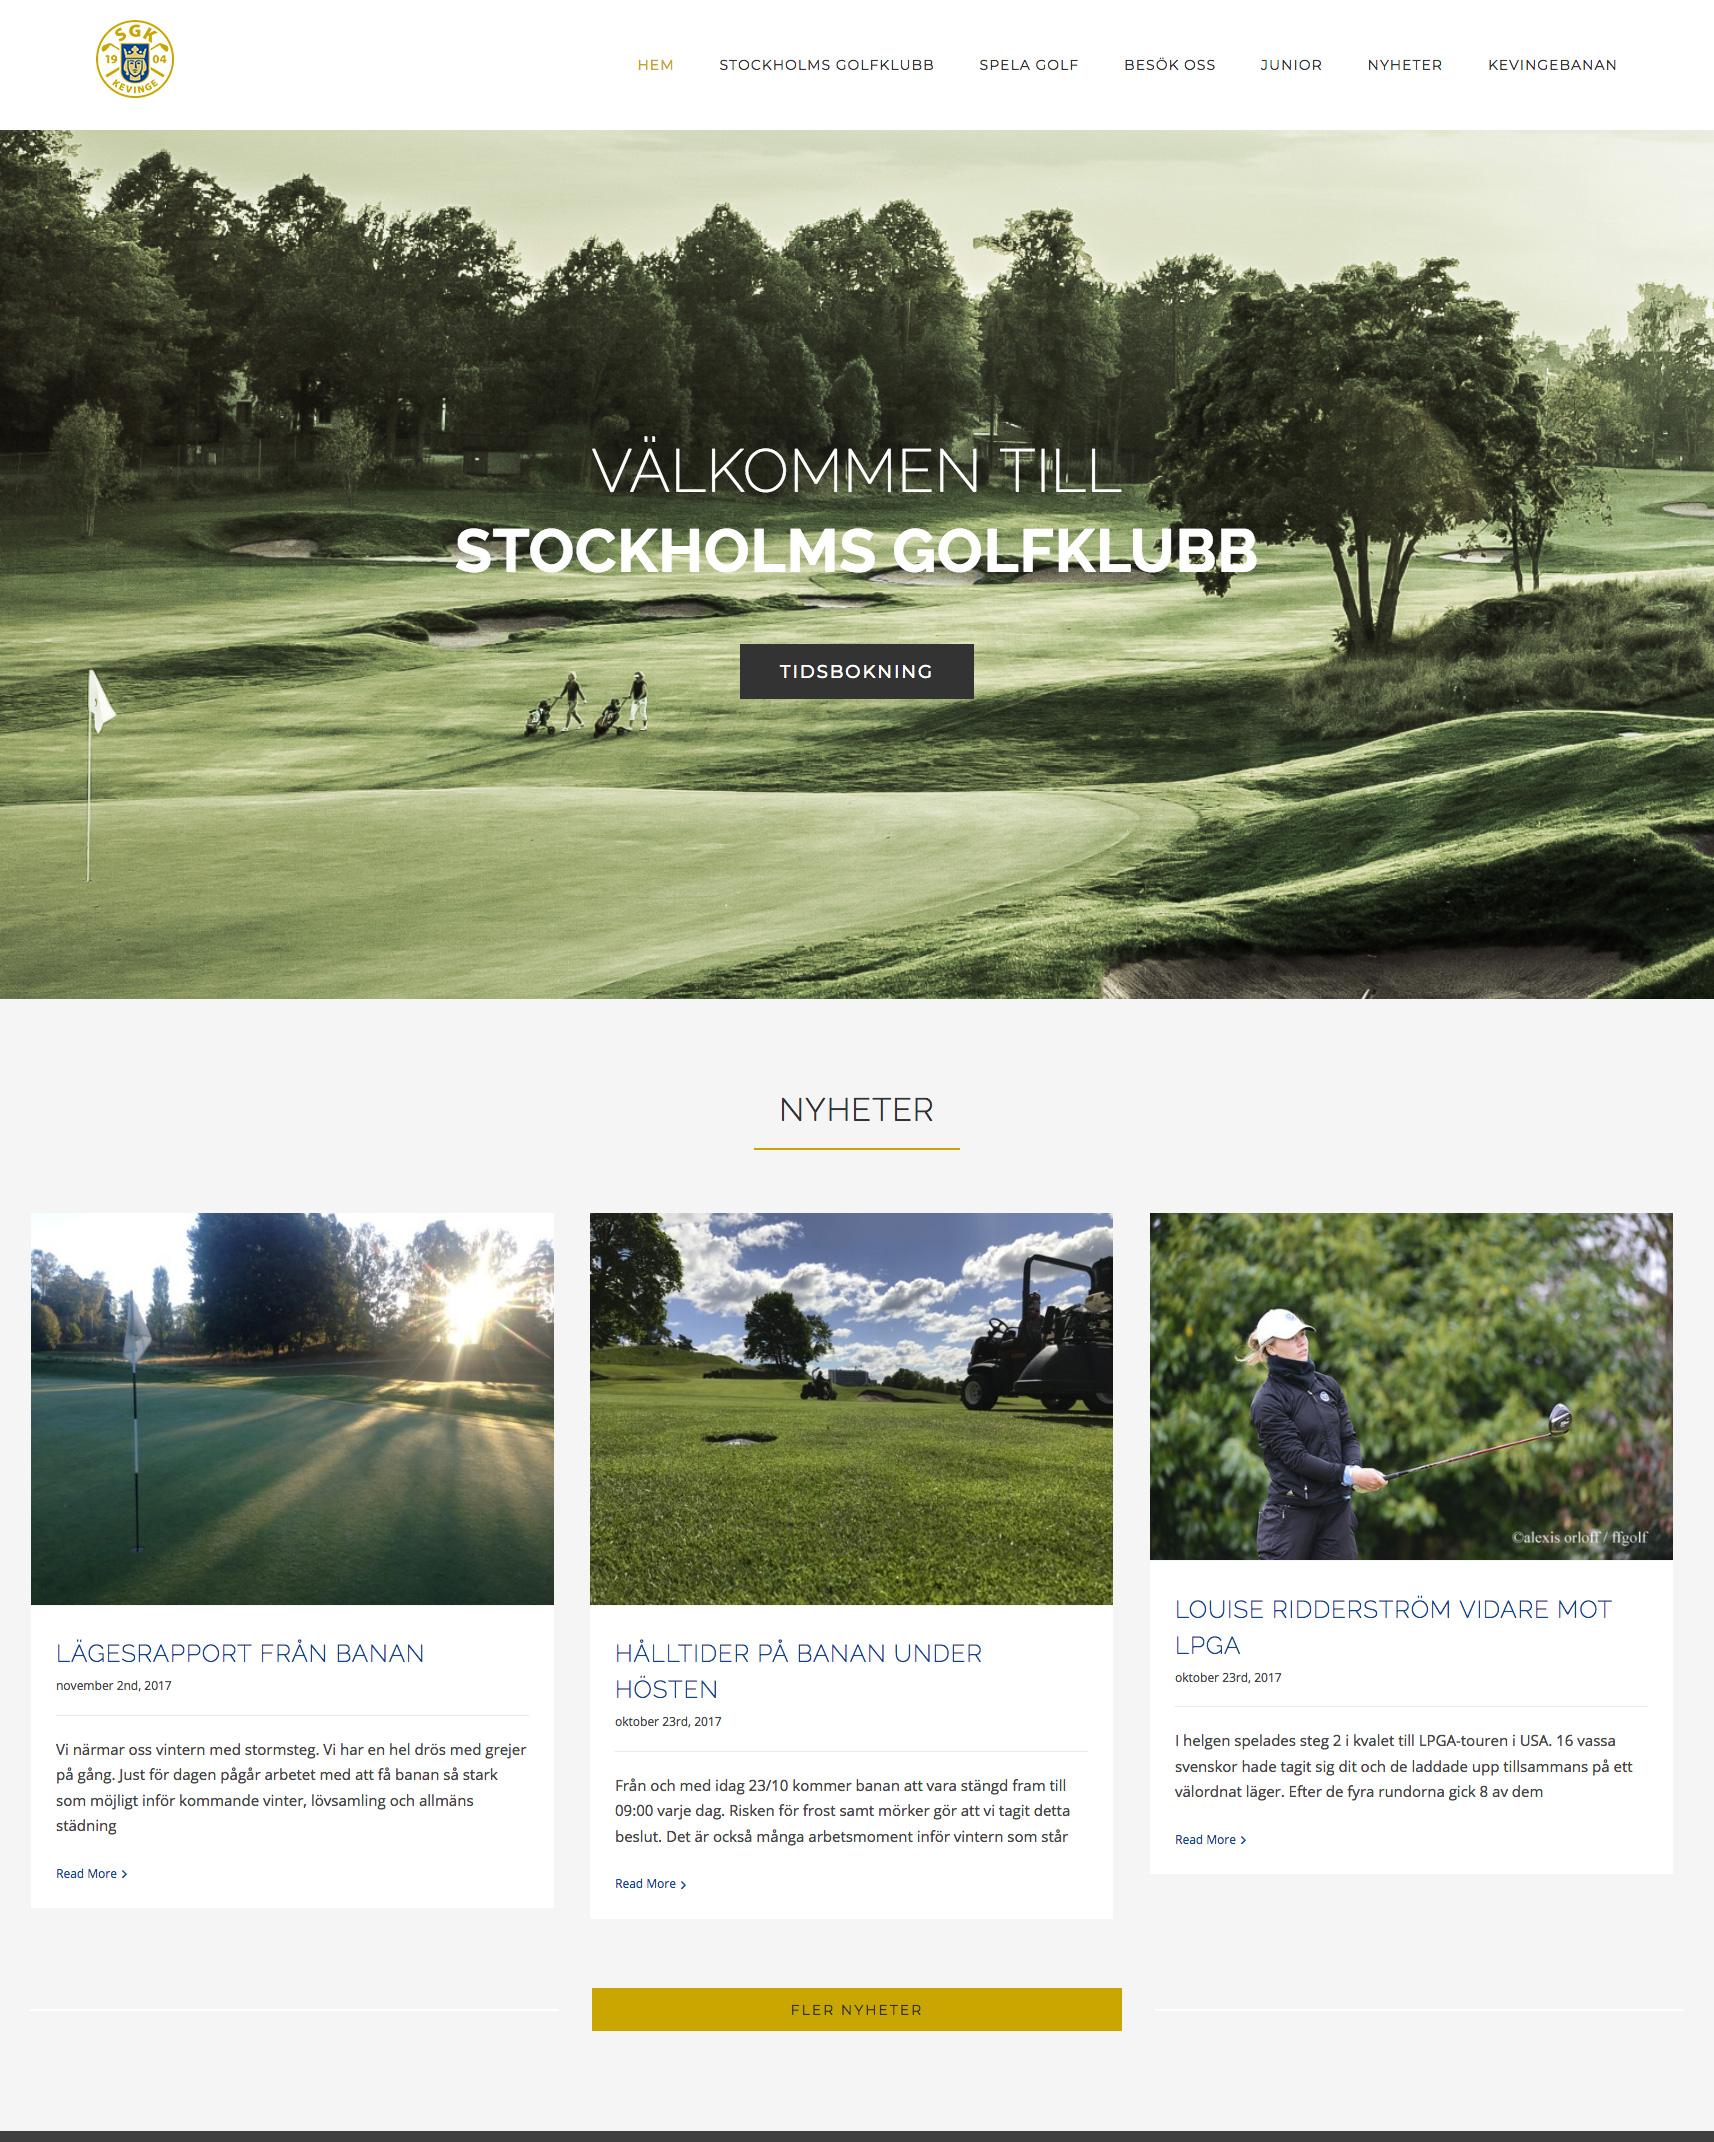 Hem - Stockholms Golfklubb